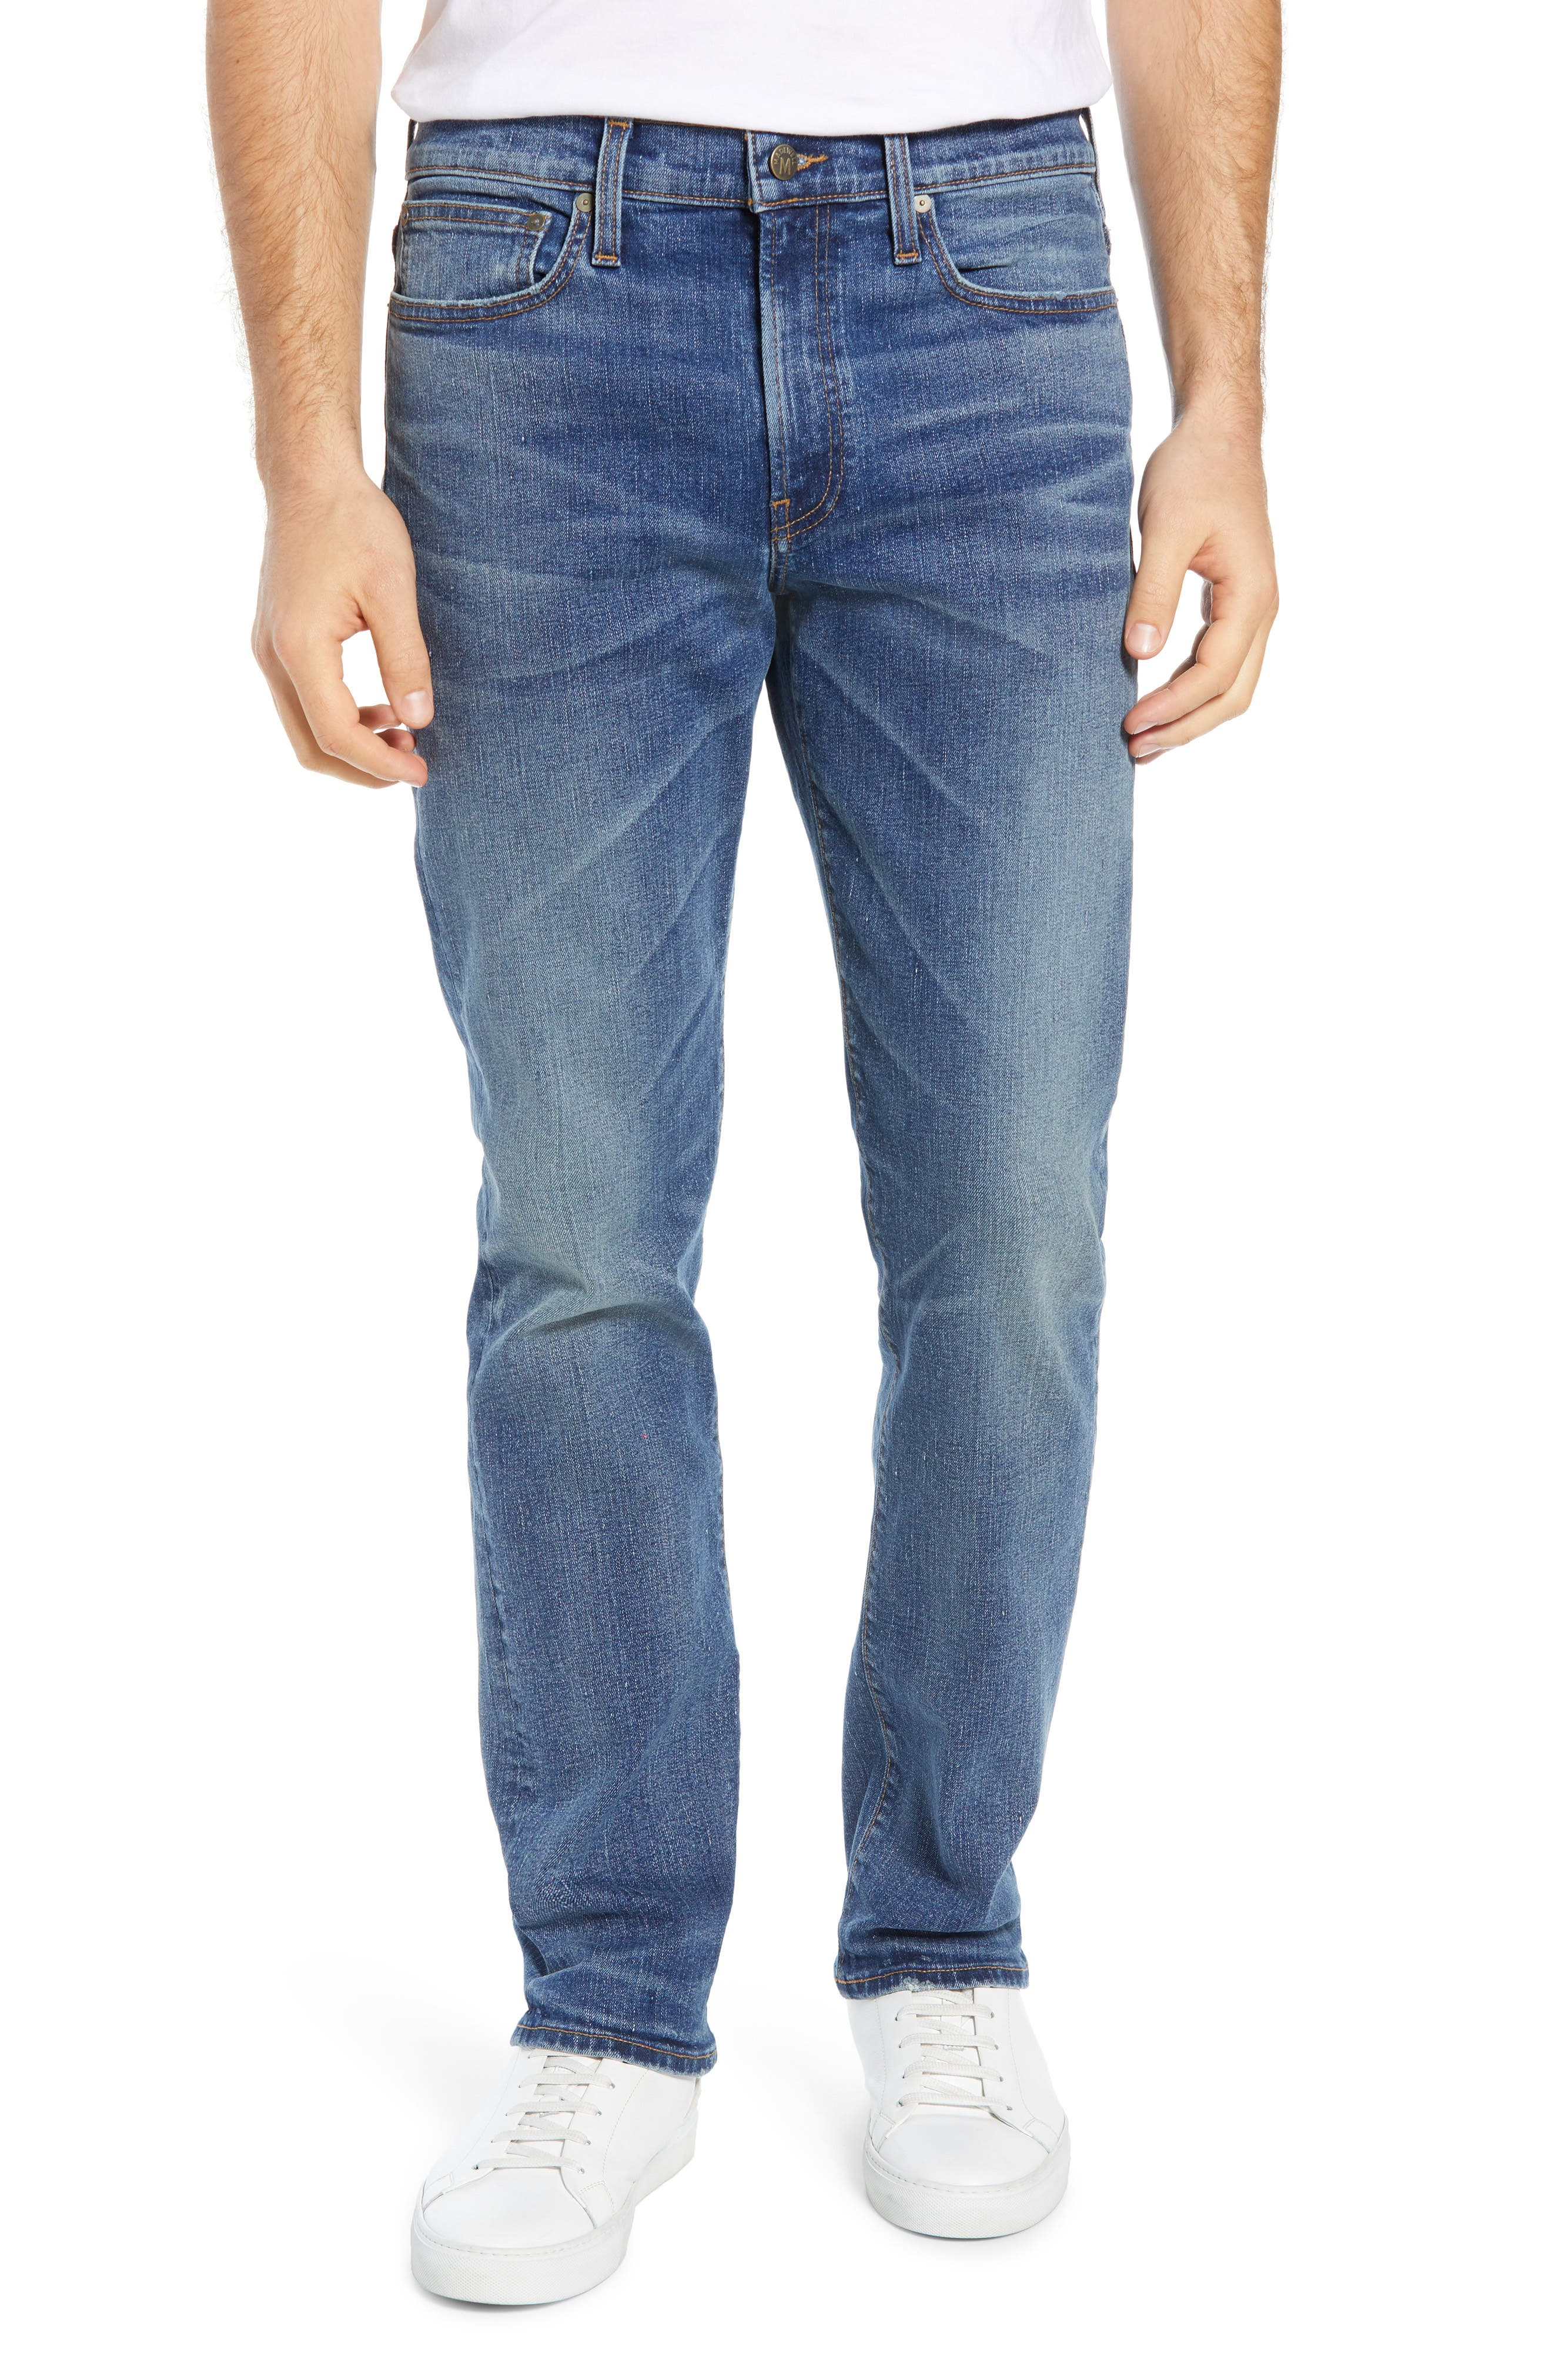 MADEWELL Straight Leg Jeans, Main, color, ARCWOOD